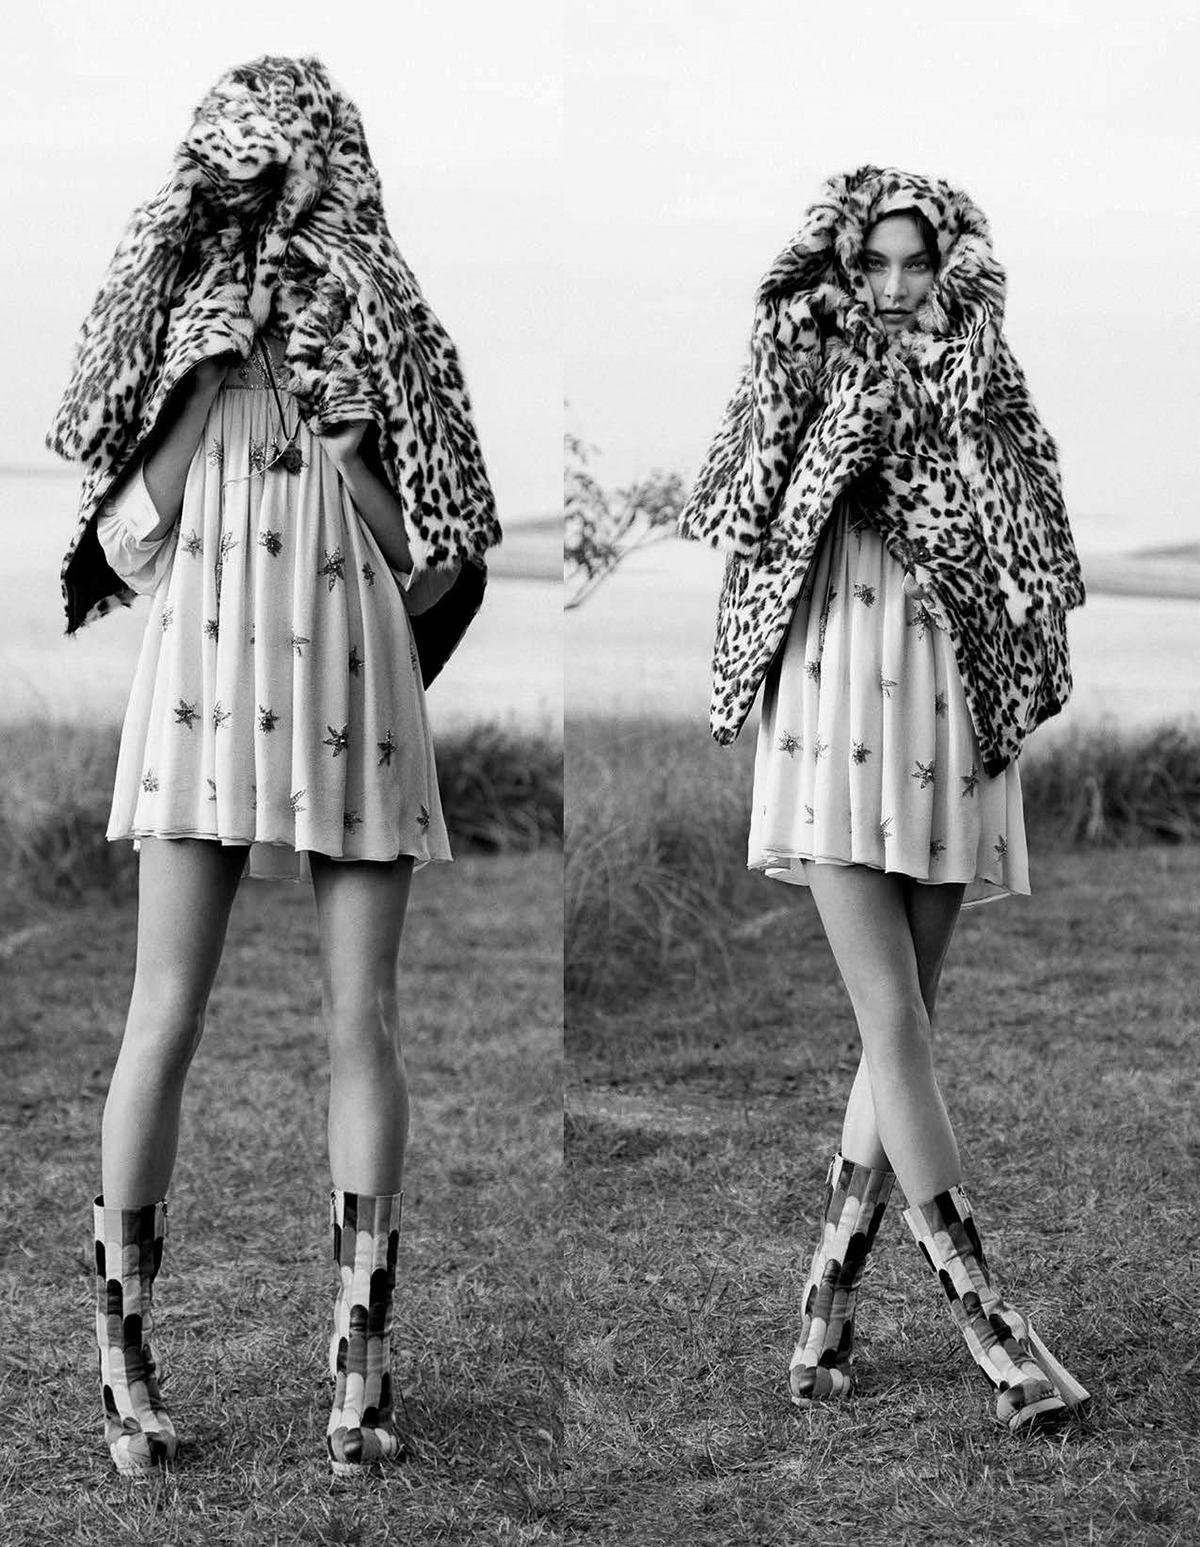 visual optimism; fashion editorials, shows, campaigns & more!: bohemian rhapsody: jacquelyn jablonski by matt jones for elle italia december 2014